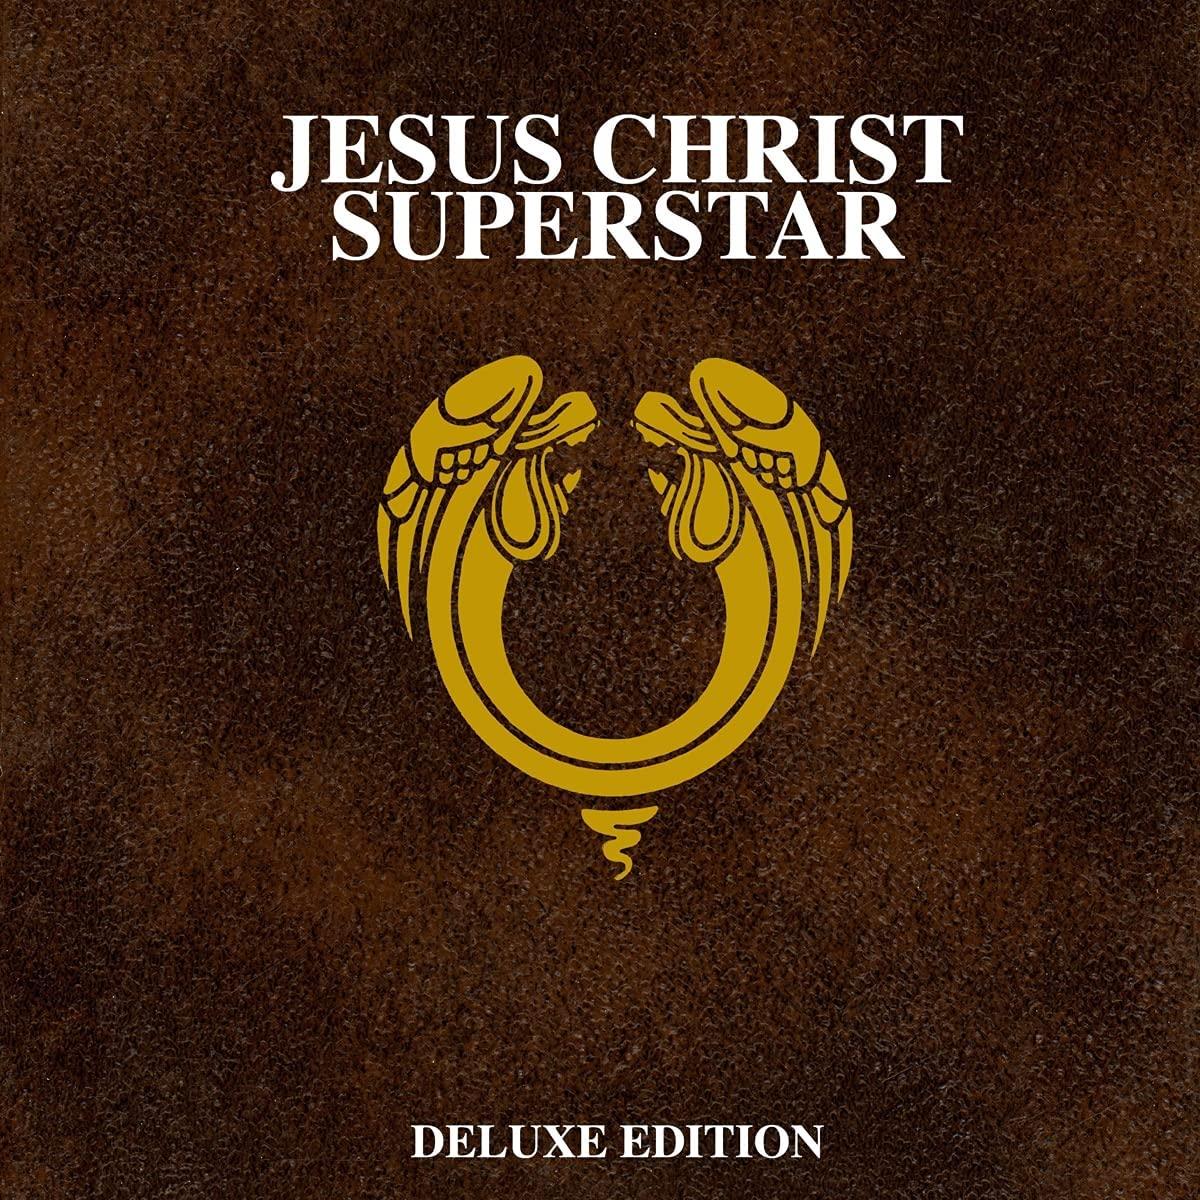 Jesus Christ Superstar deluxe edition